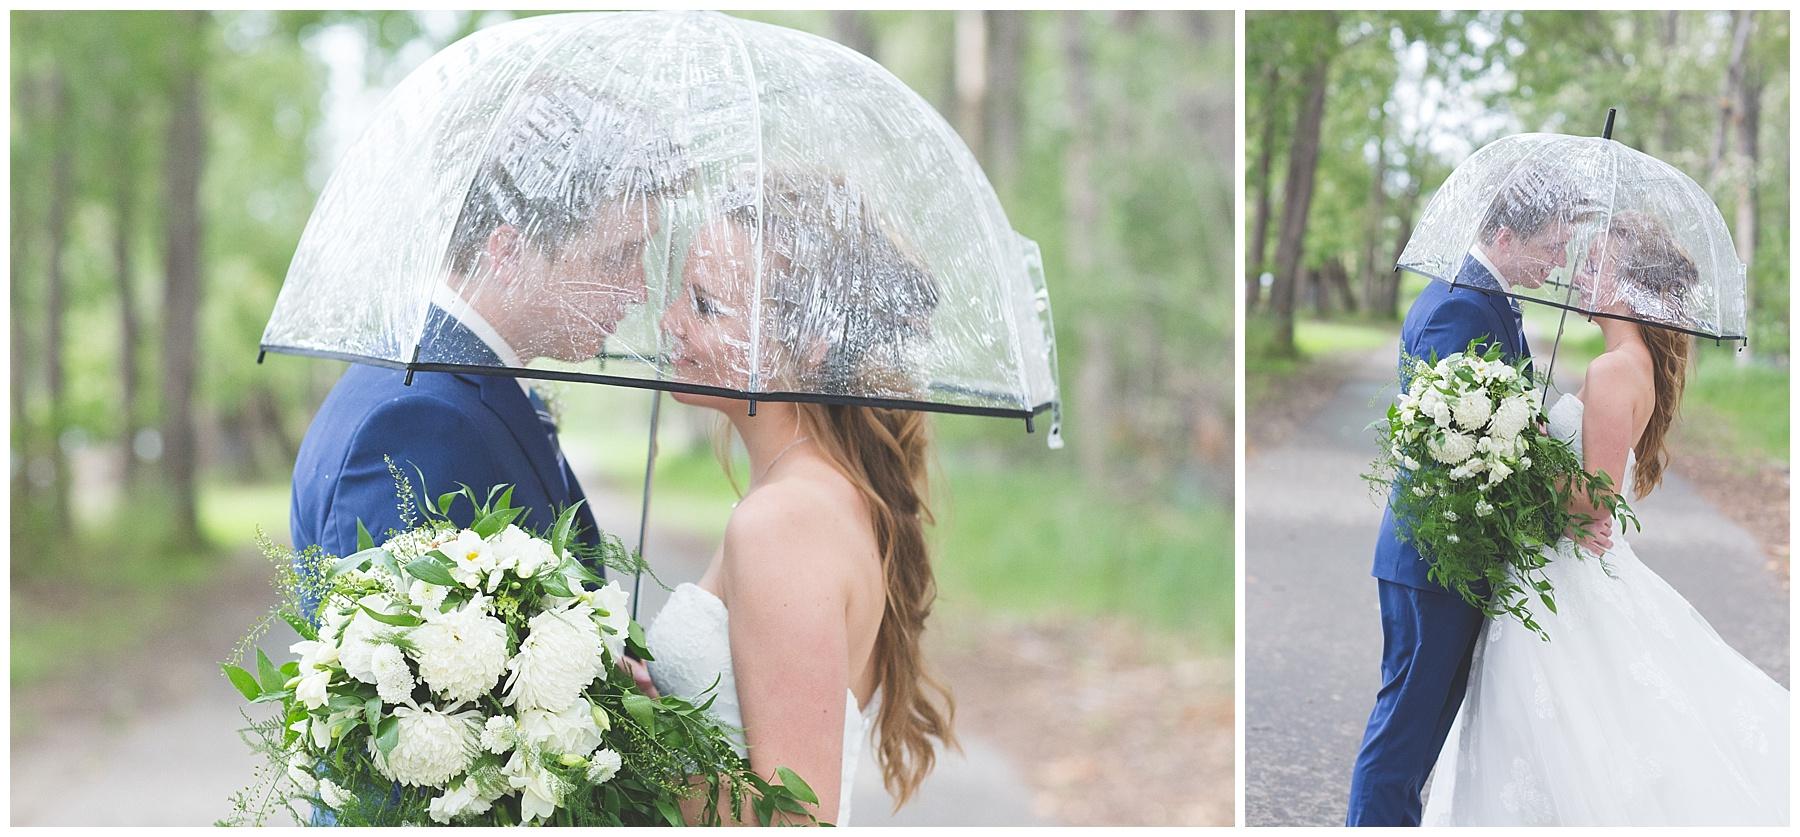 Umbrella wedding photography in Calgary Alberta